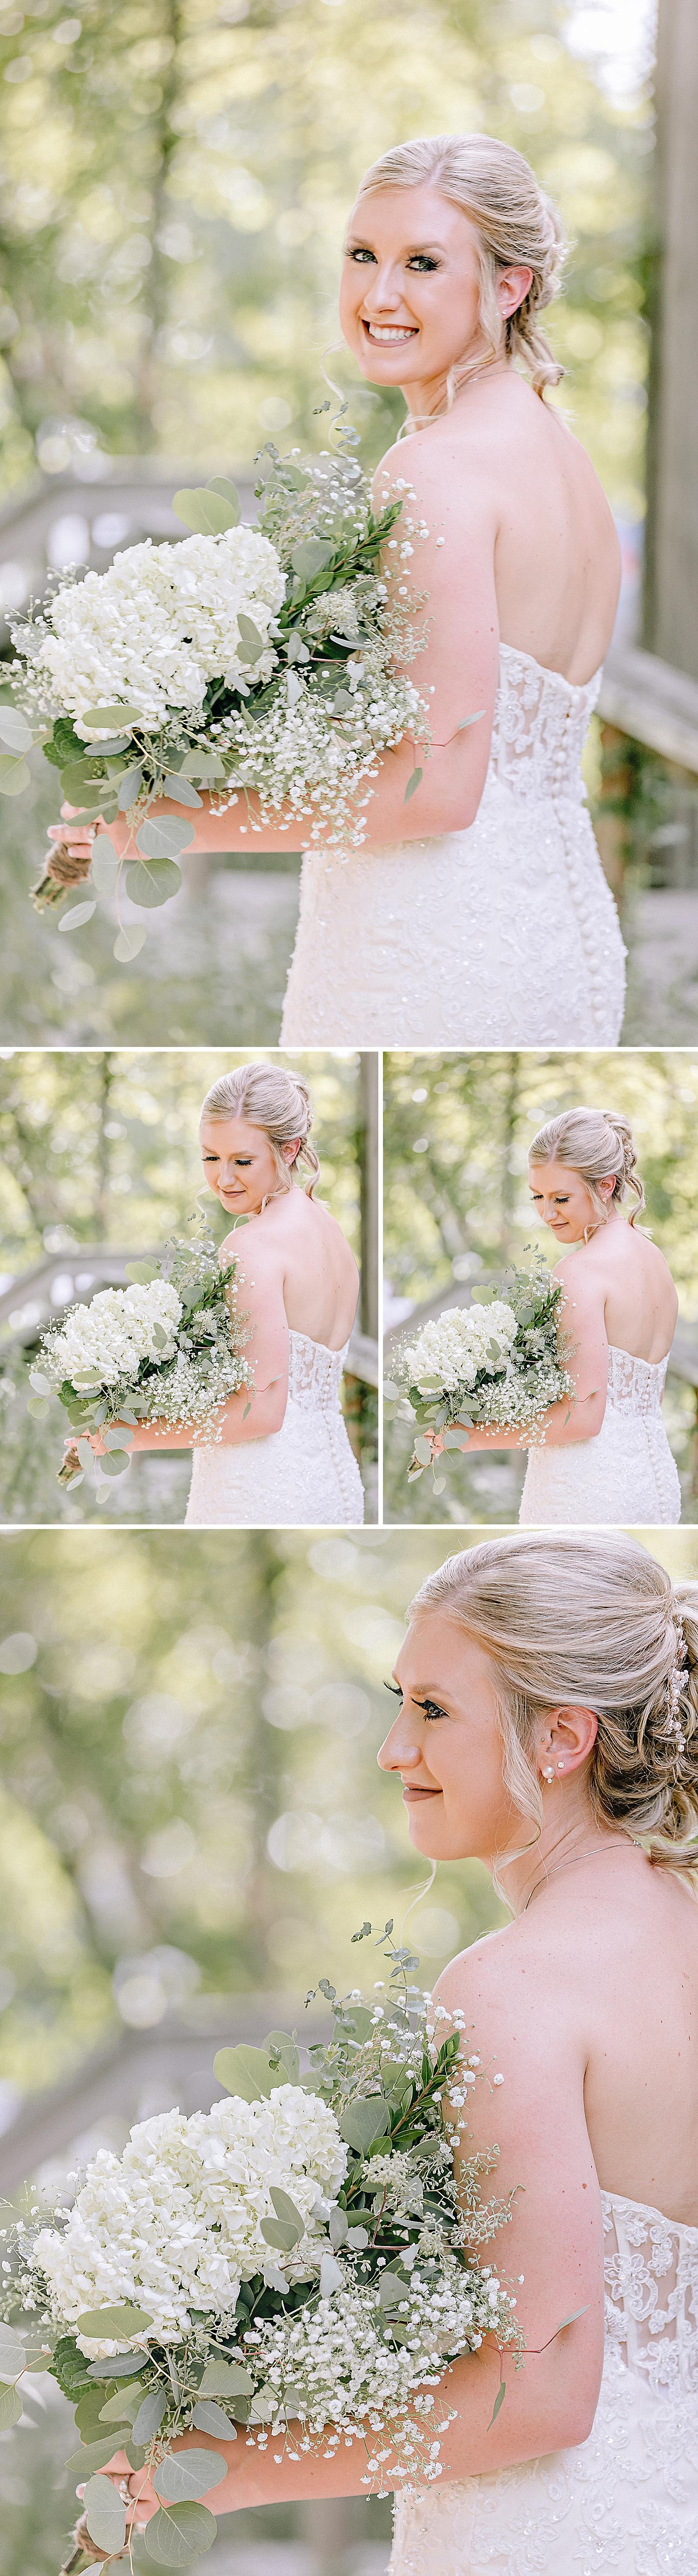 Carly-Barton-Photography-Bridal-Photos-Gruene-Rustic-New-Braunfels-Wedding-Photographer_0011.jpg